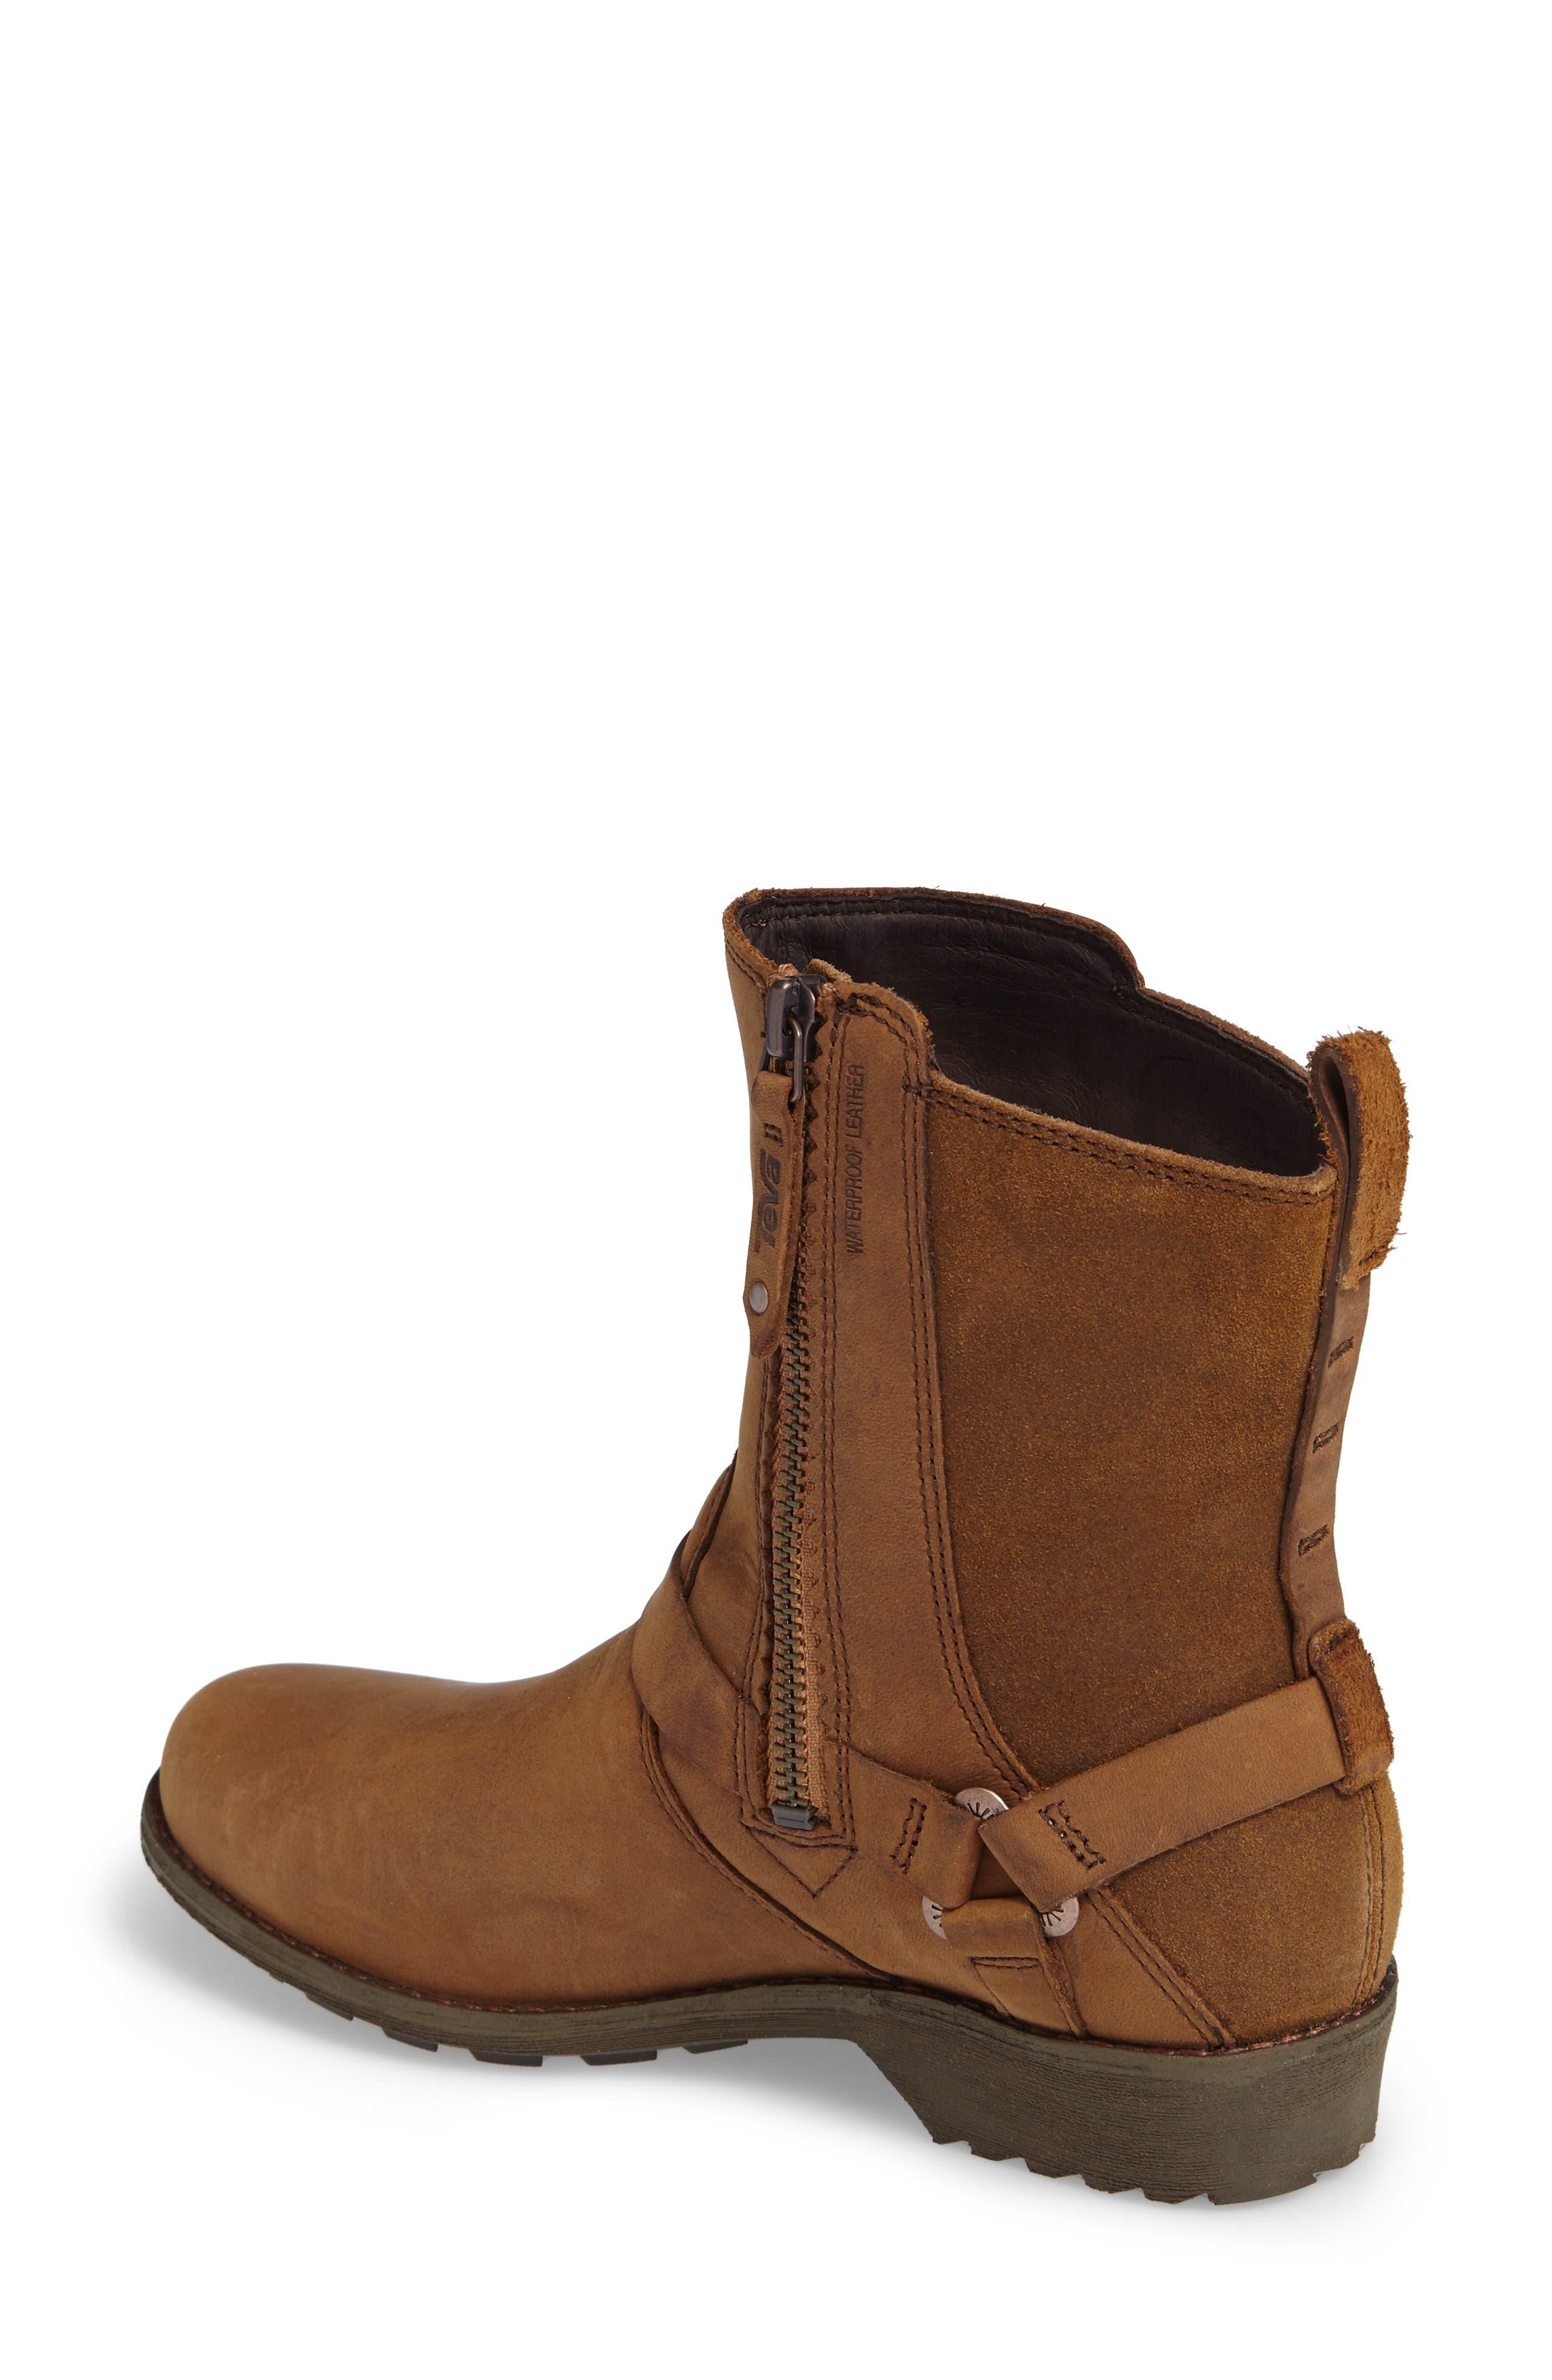 Dina La Vina Dos Waterproof Boot,                             Alternate thumbnail 2, color,                             Bison Leather